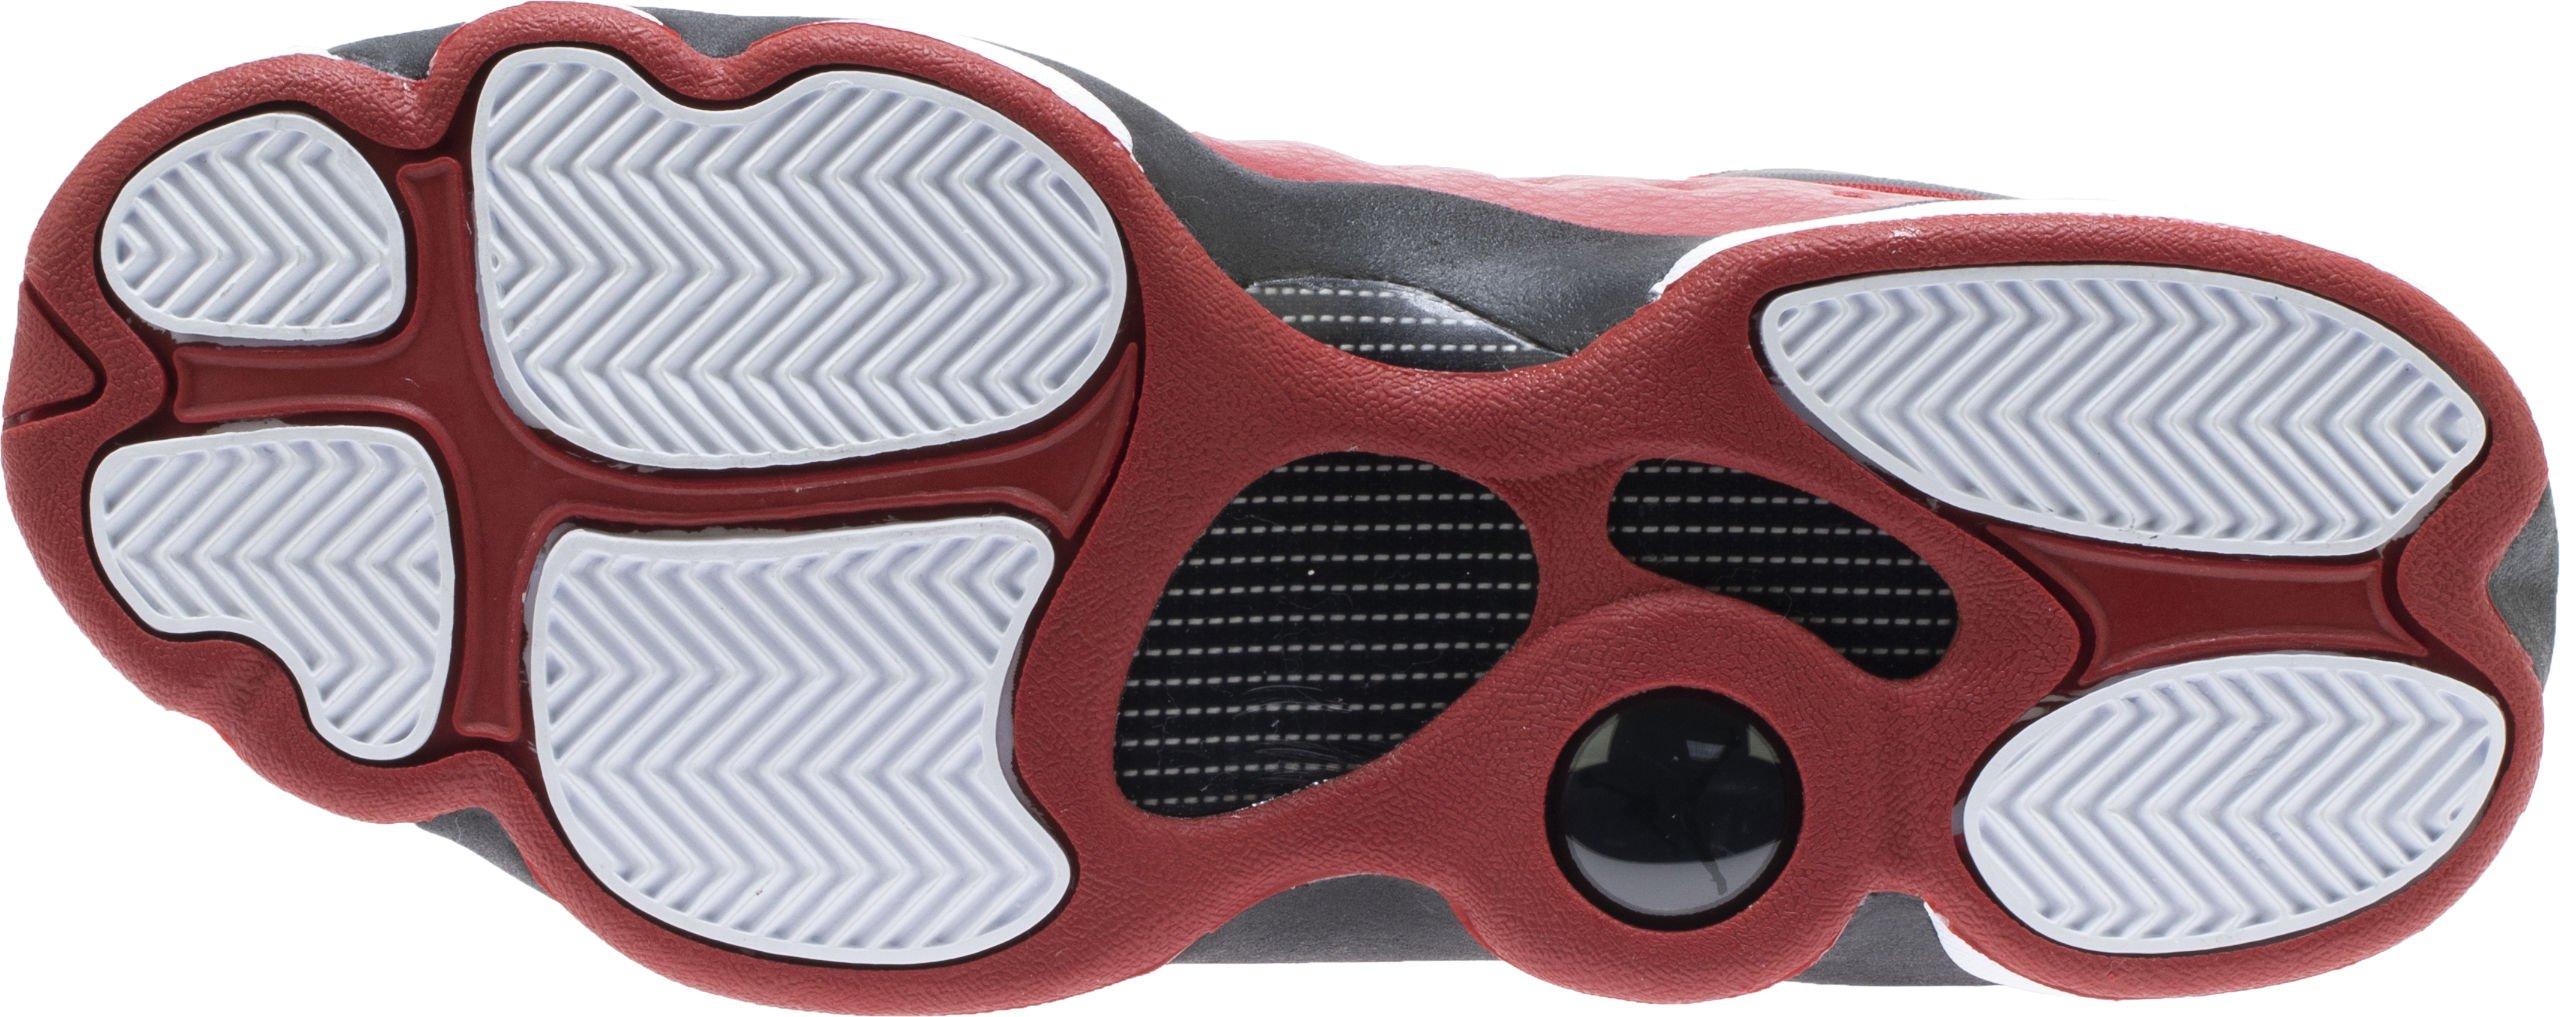 Jordan Kids Jumpman Team II GS Gym RED Gym RED Black White Size 3.5 by Jordan (Image #6)